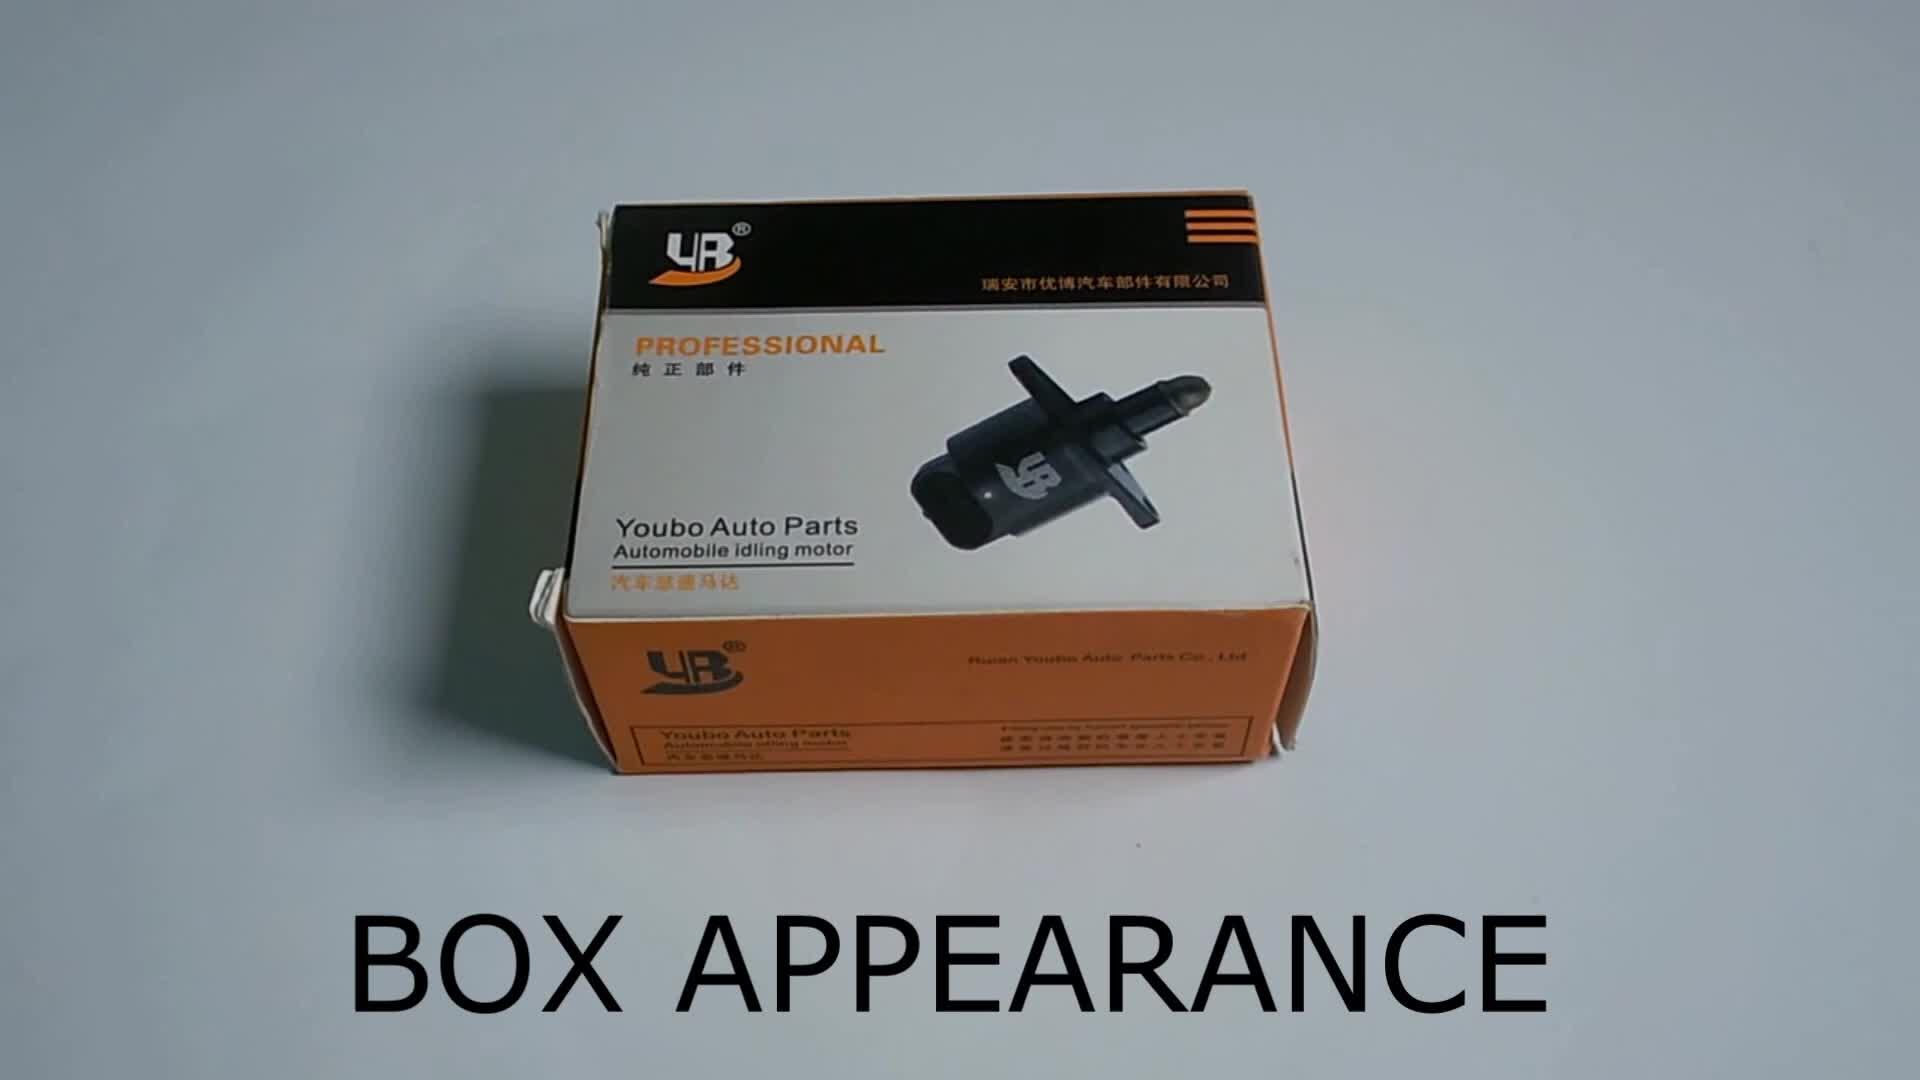 MD628168 1450A132 IACV ICV Auto Ersatzteile Motor Schrittmotor Hersteller Idle Air Control Ventil